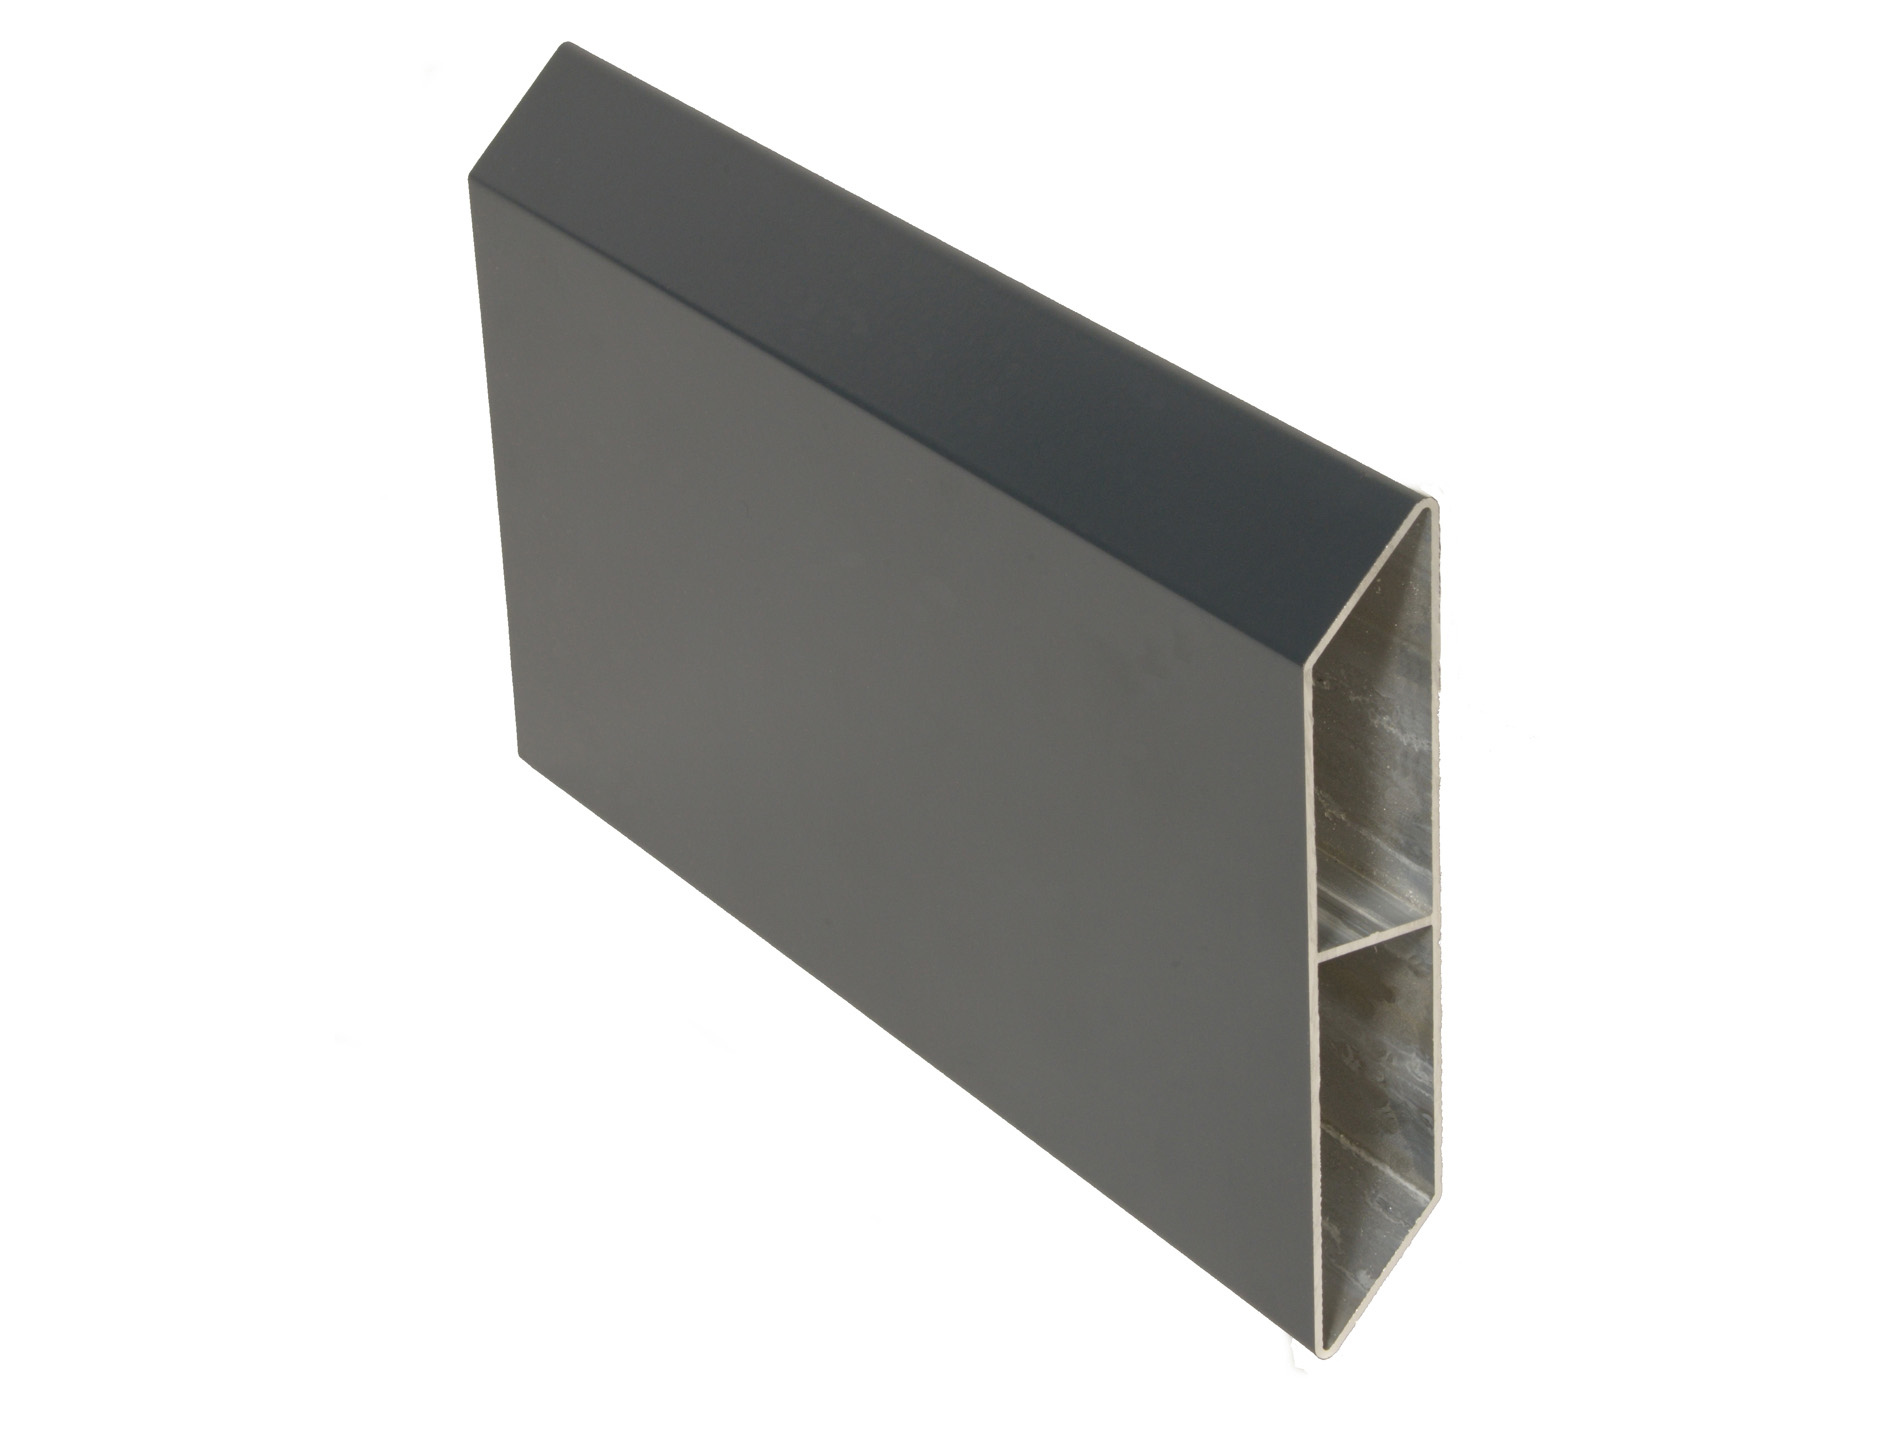 Lame palissade alu gris clair for Palissade aluminium prix